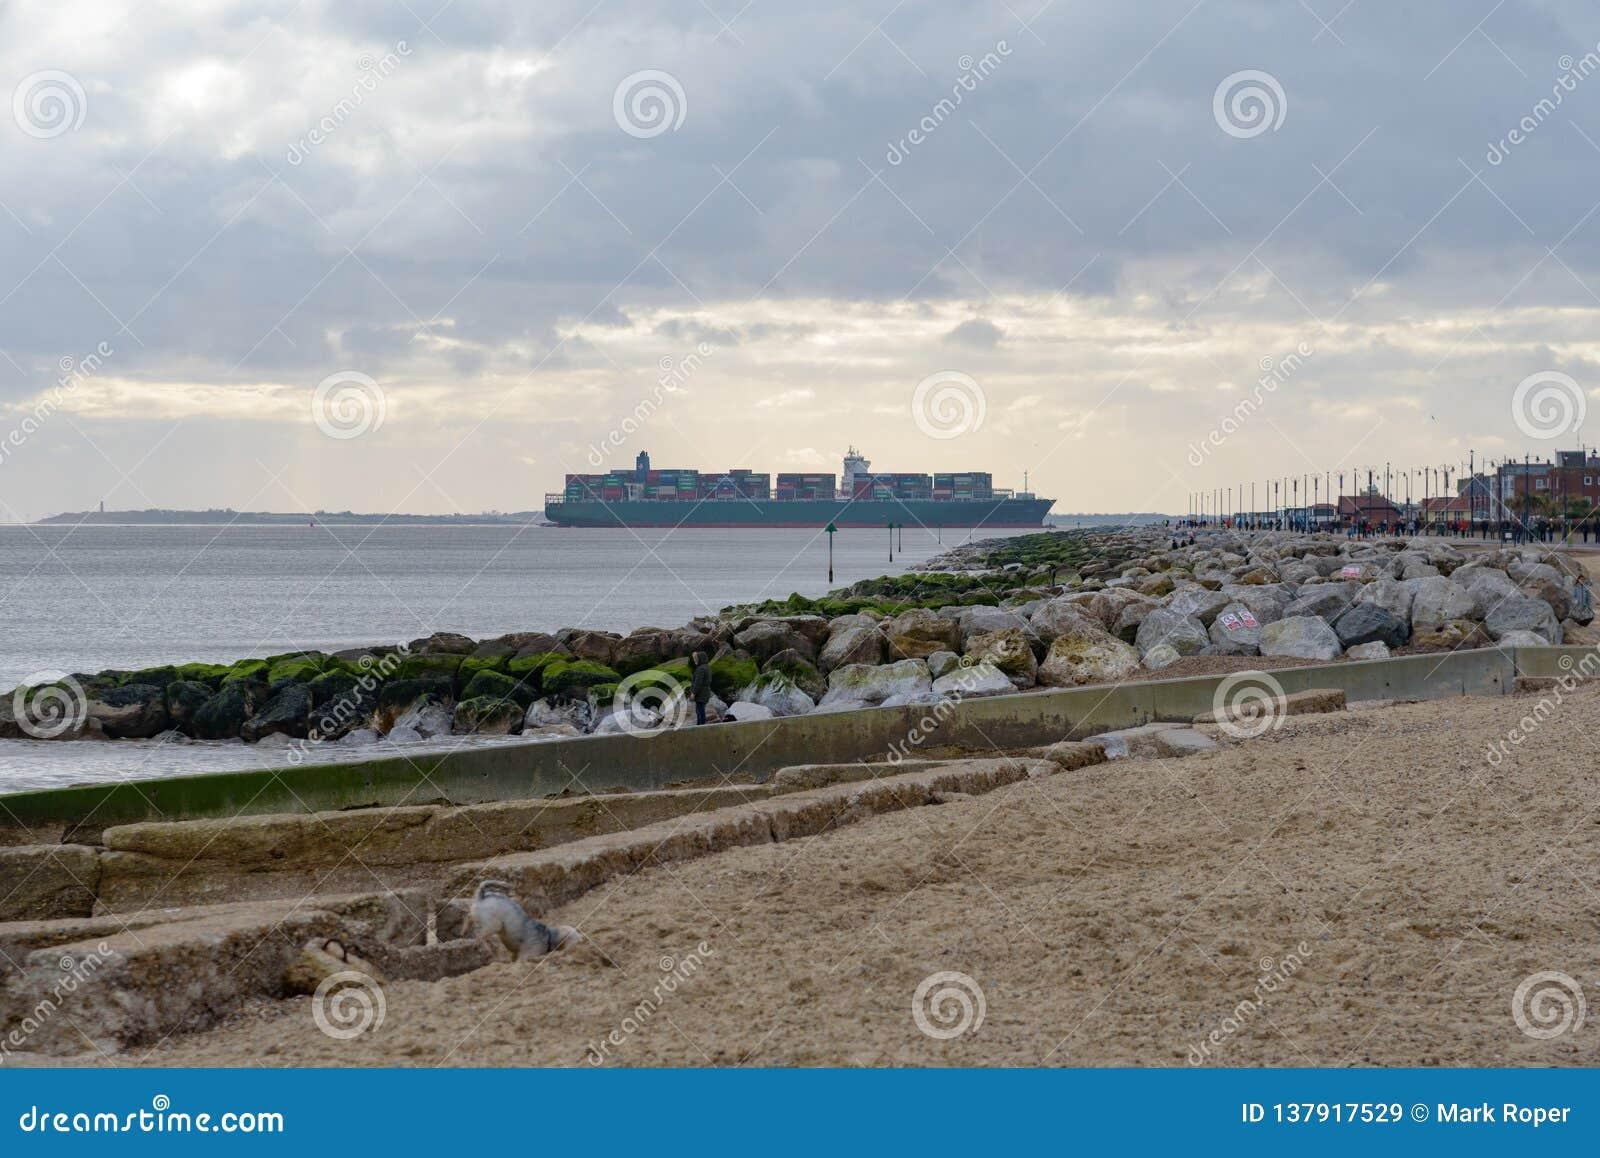 FELIXSTOWE, VEREINIGTES KÖNIGREICH - 27. JANUAR 2019: Thalassa Doxa-Containerschiff an der Felixstowe-Seeseiteüberschrift in Rich